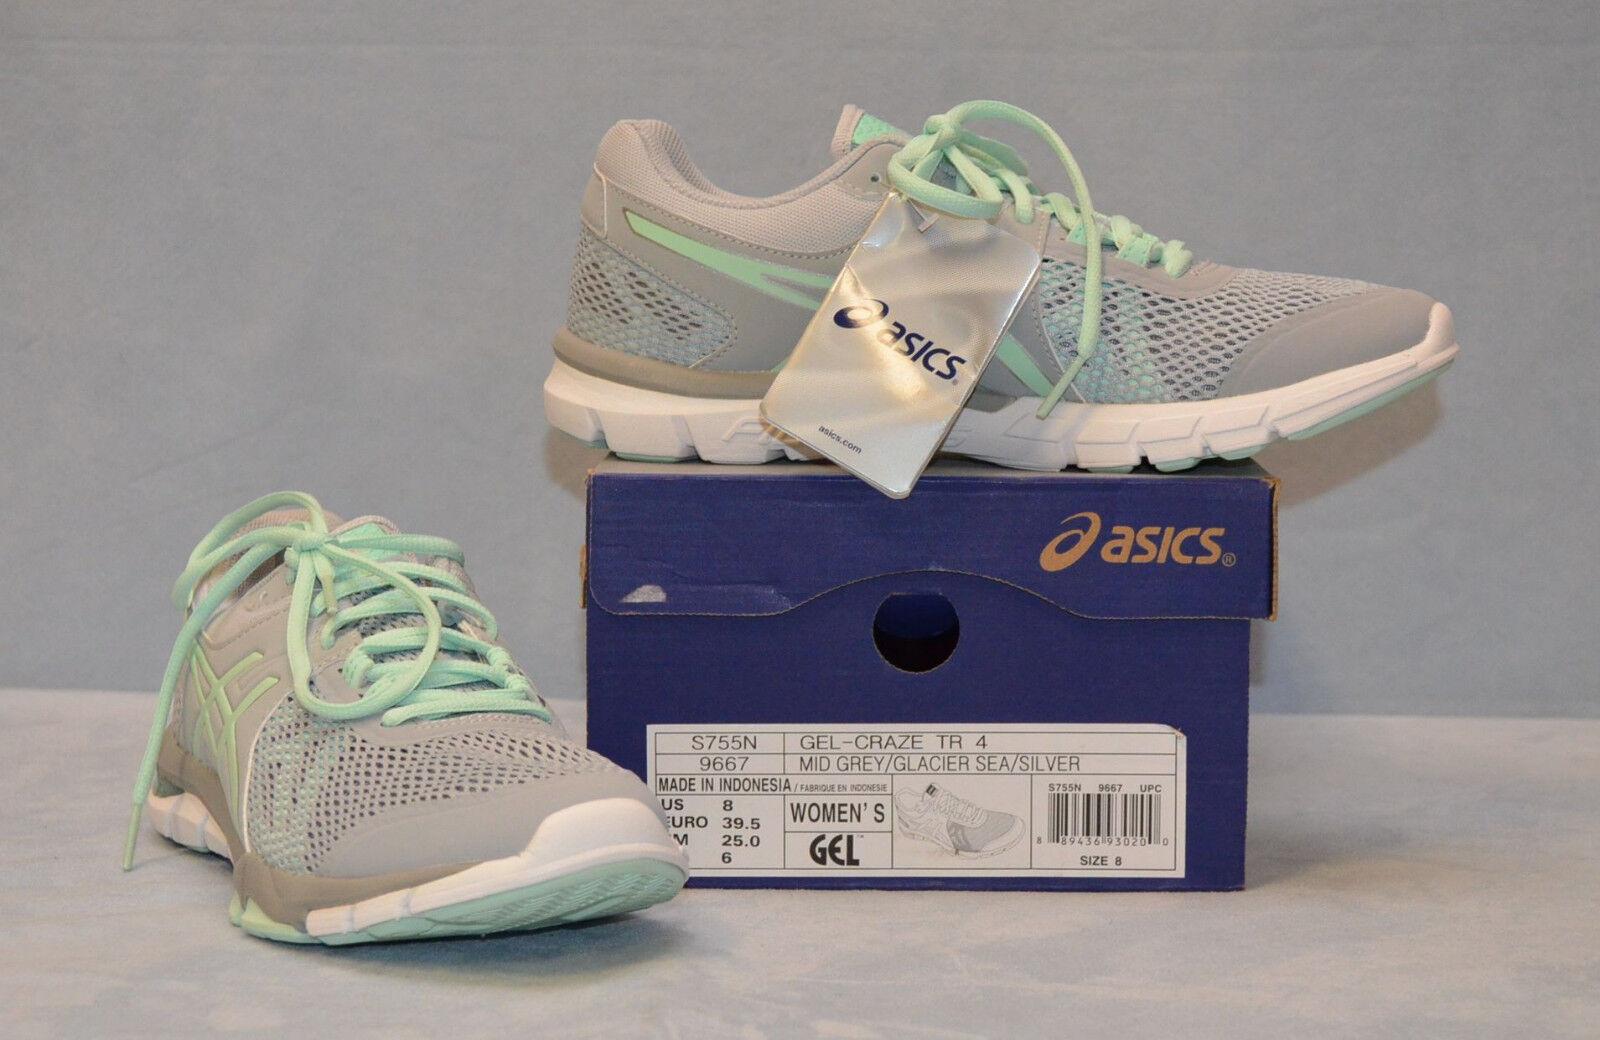 B0 NEW ASICS Gel-Craze TR 4 Mid Grey Glacier Sea Sea Sea Slvr Running shoes S755N Sz 8 M aa6ac3